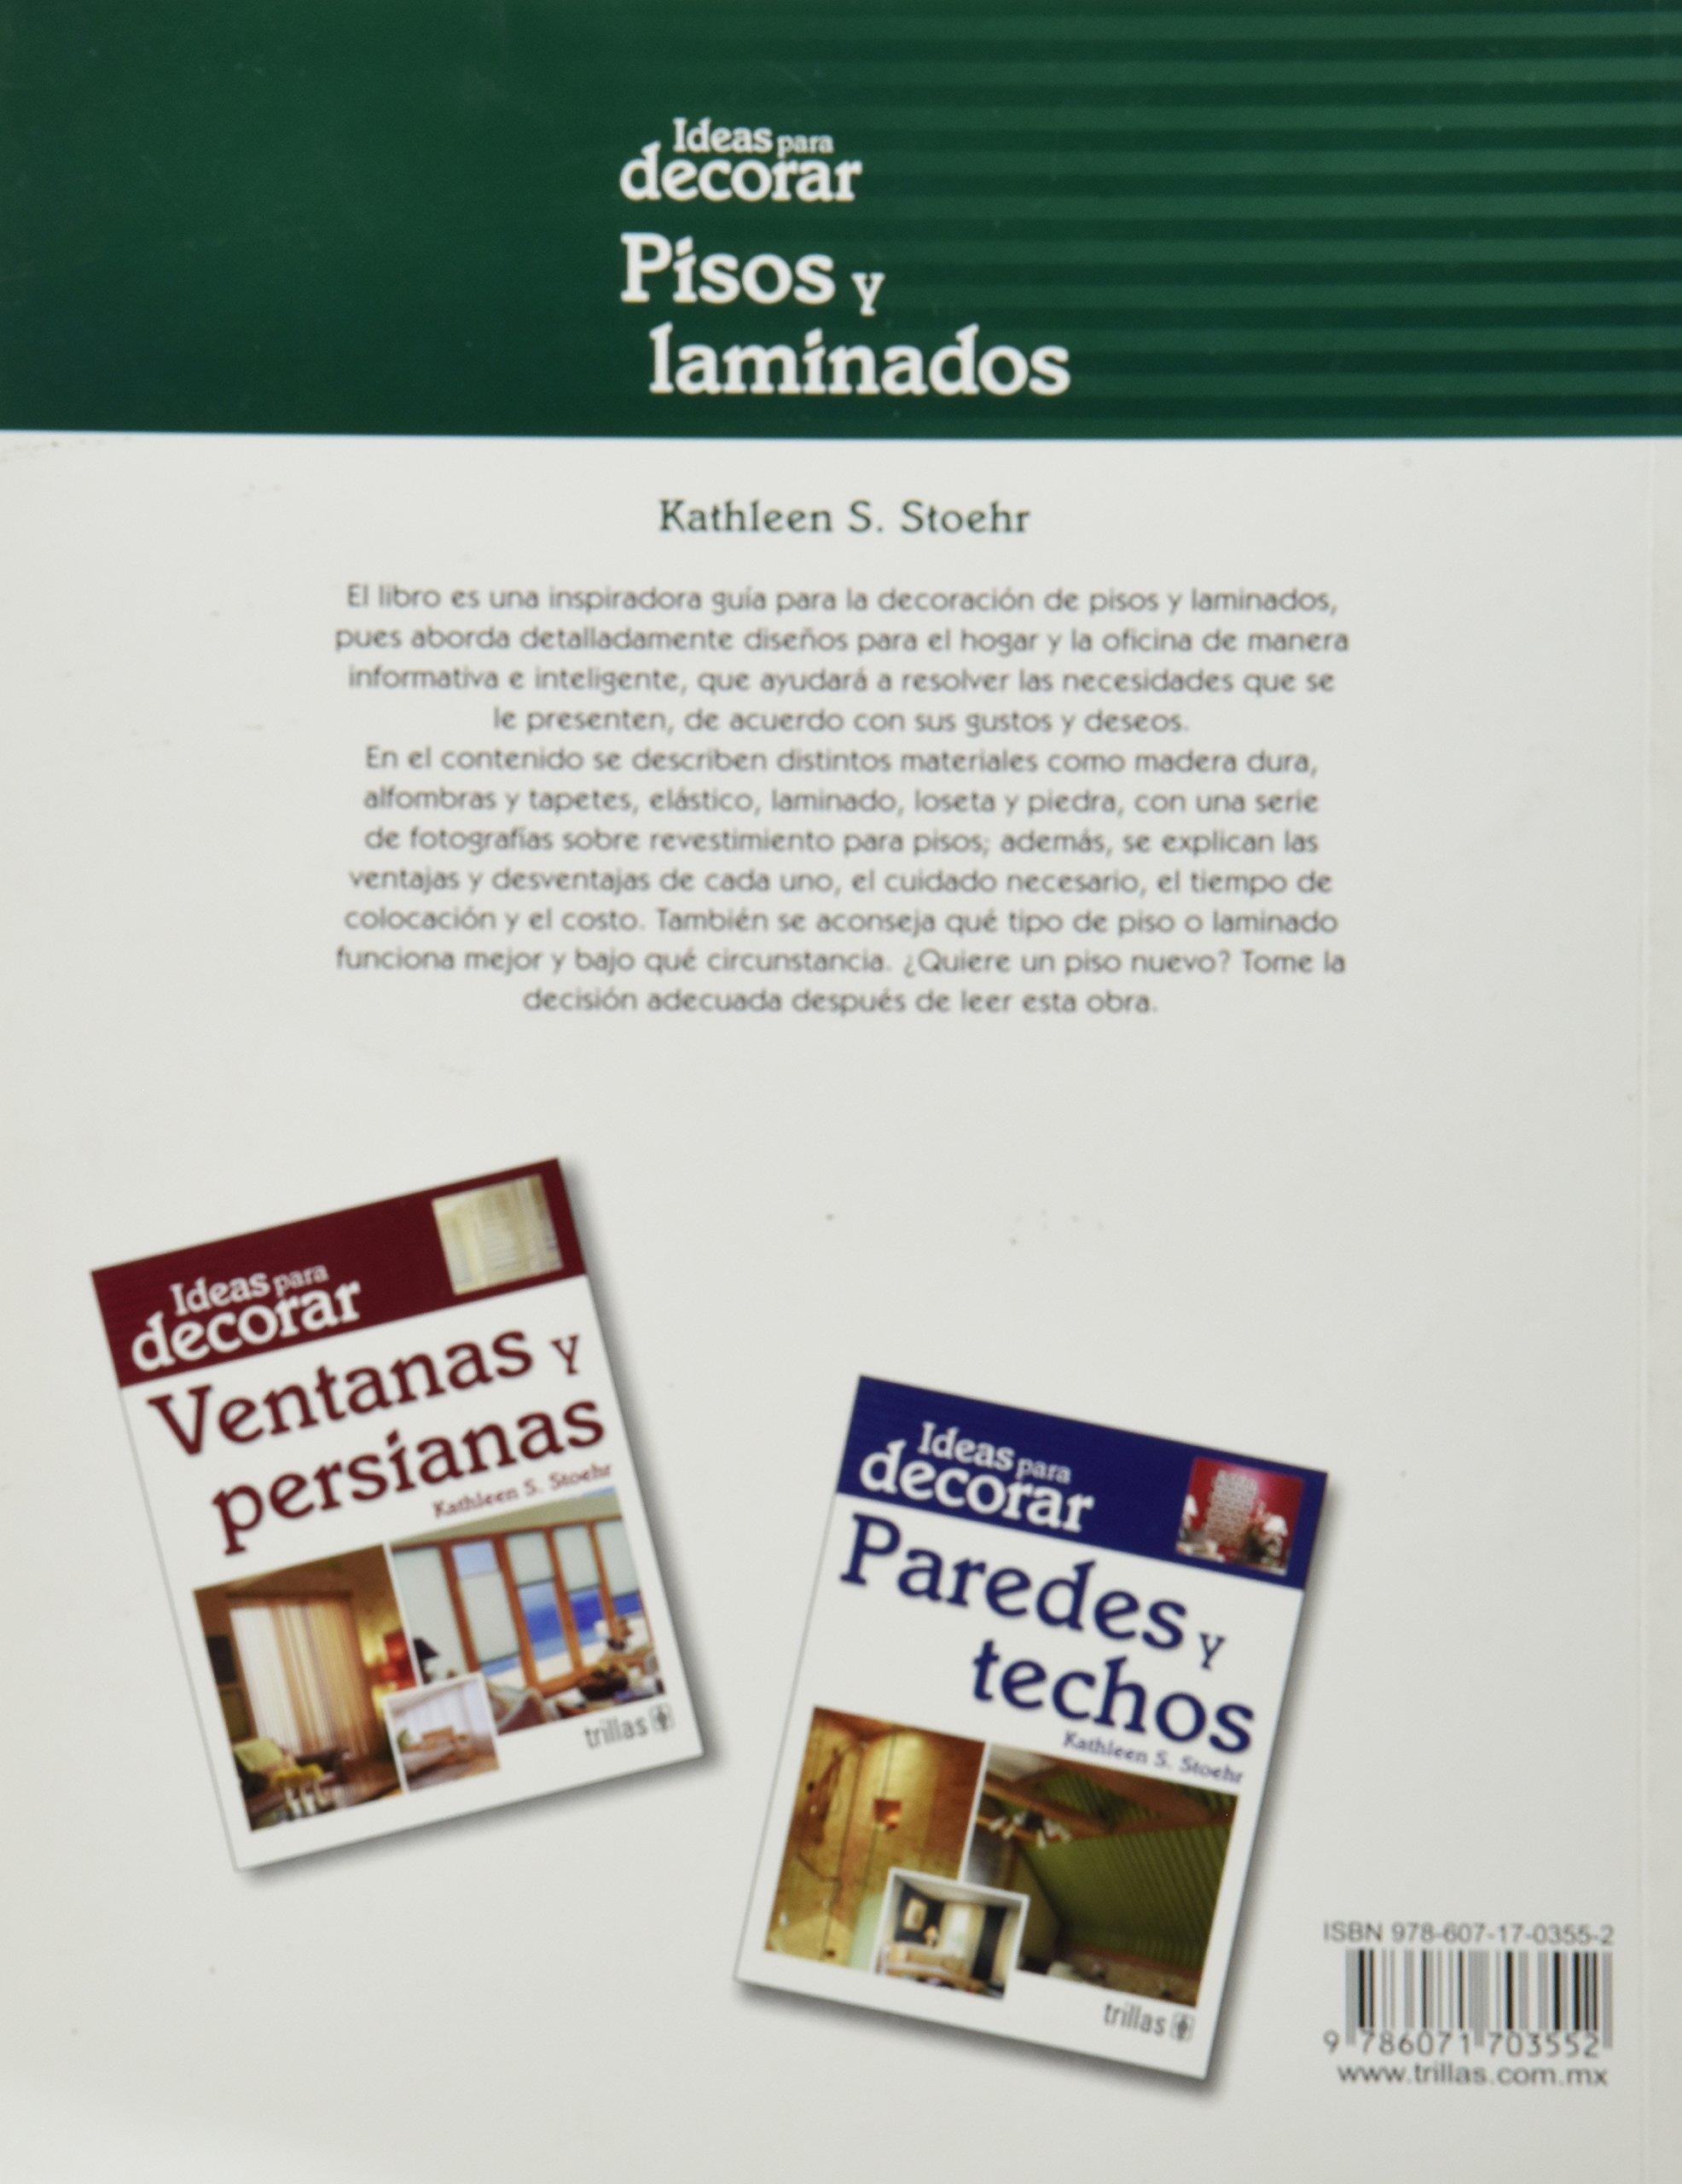 Pisos y laminados / Dream Floors: Ideas para decorar / Hundreds of Design Ideas for Every Kind of Floor (Spanish Edition) by Editorial Trillas Sa De Cv (Image #2)